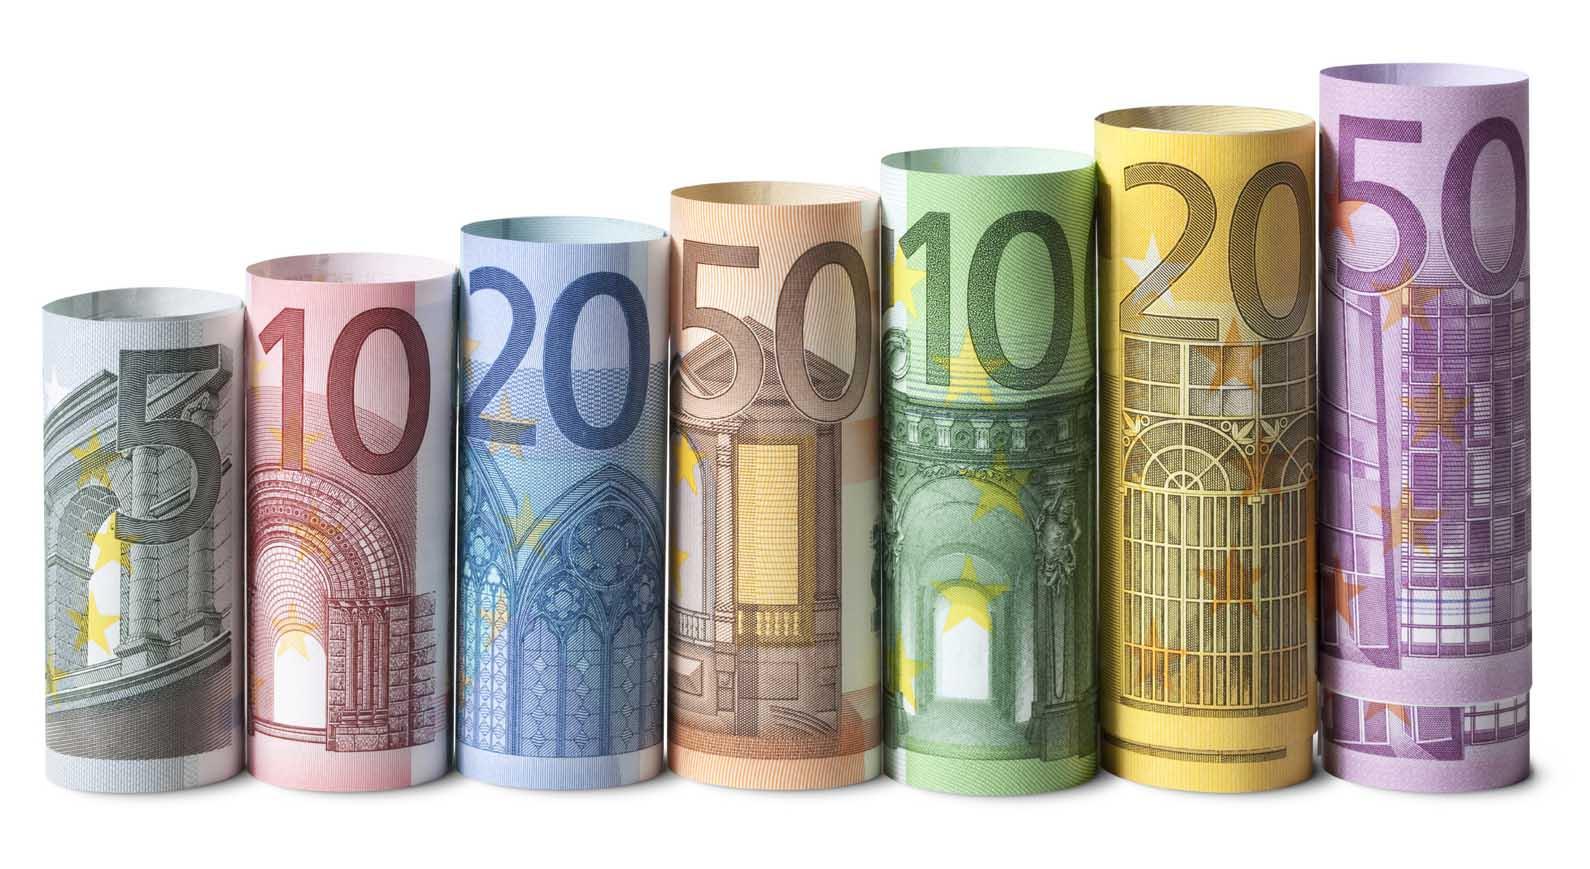 euro soldi denaro biglietti arrotolati scala